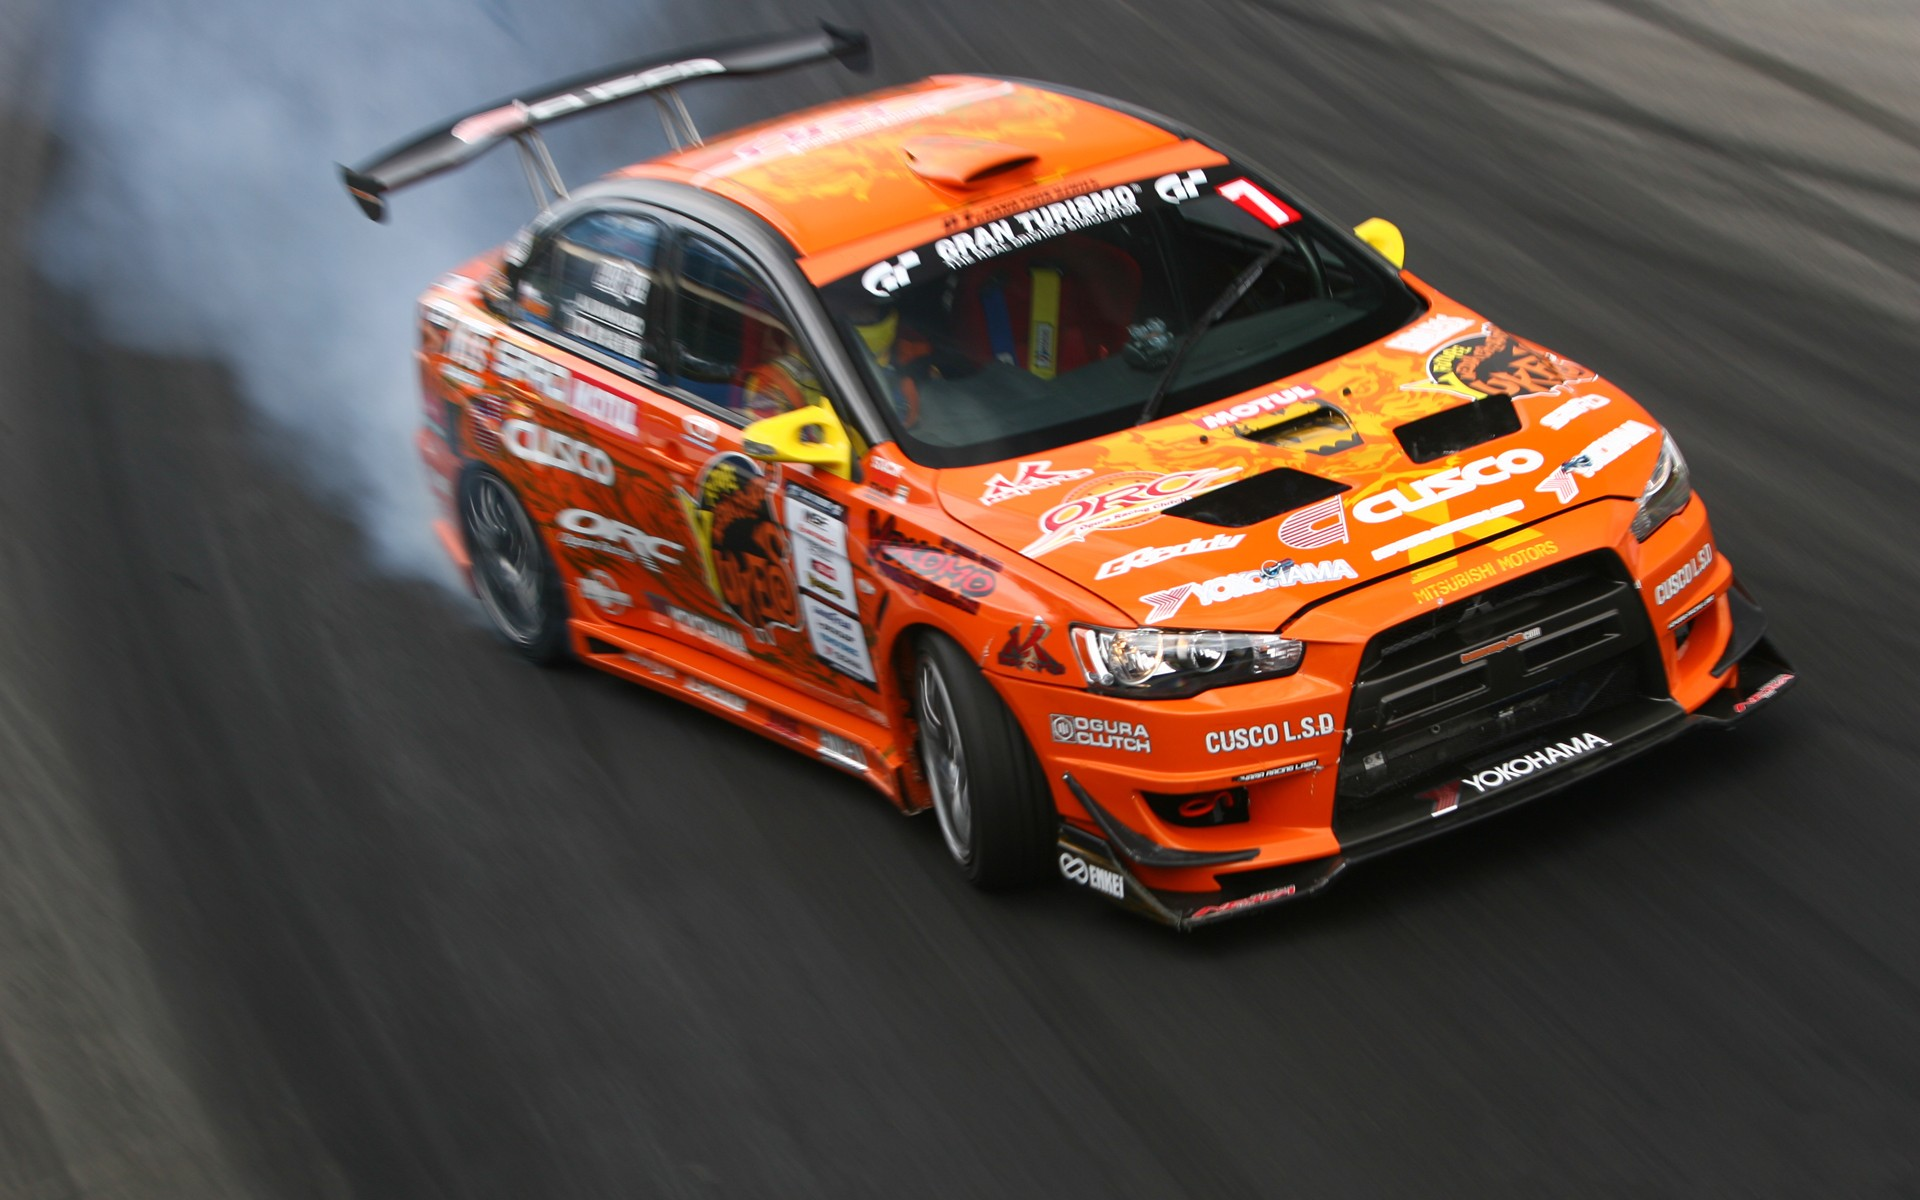 cars lancer evo drifting cars vehicles formula drift mitsubishi